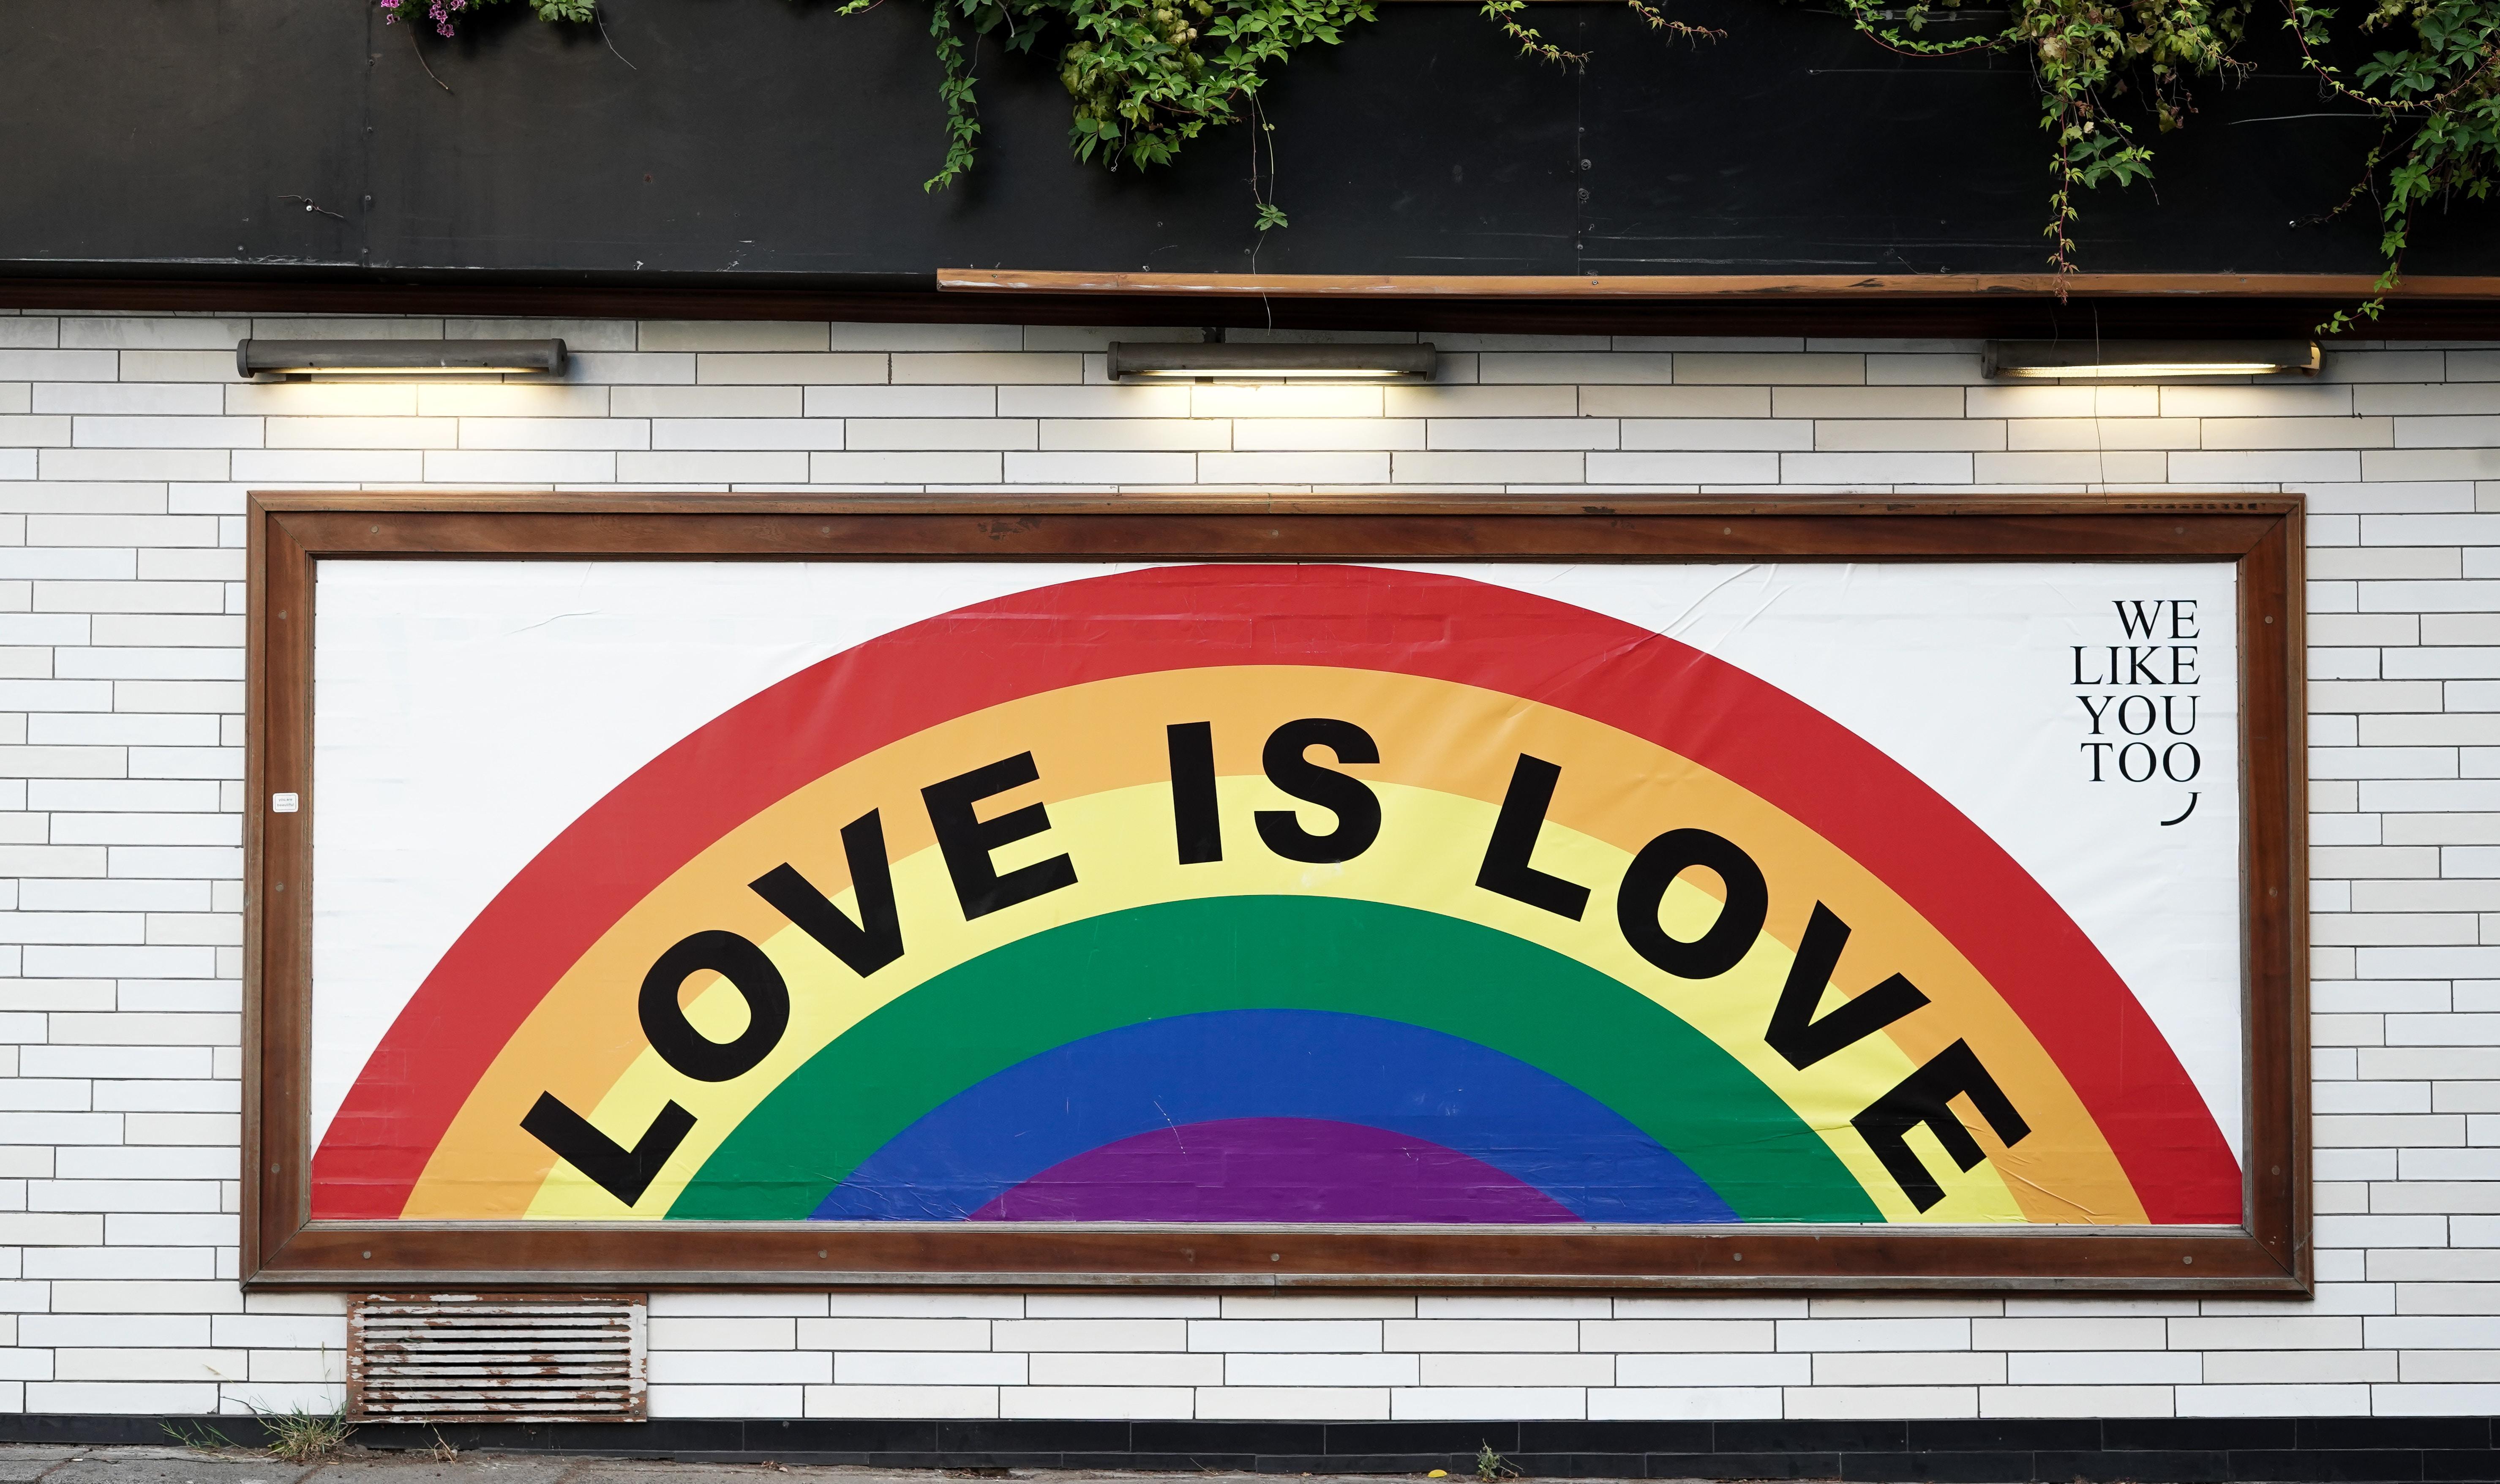 pride fierté lgbtq love is love